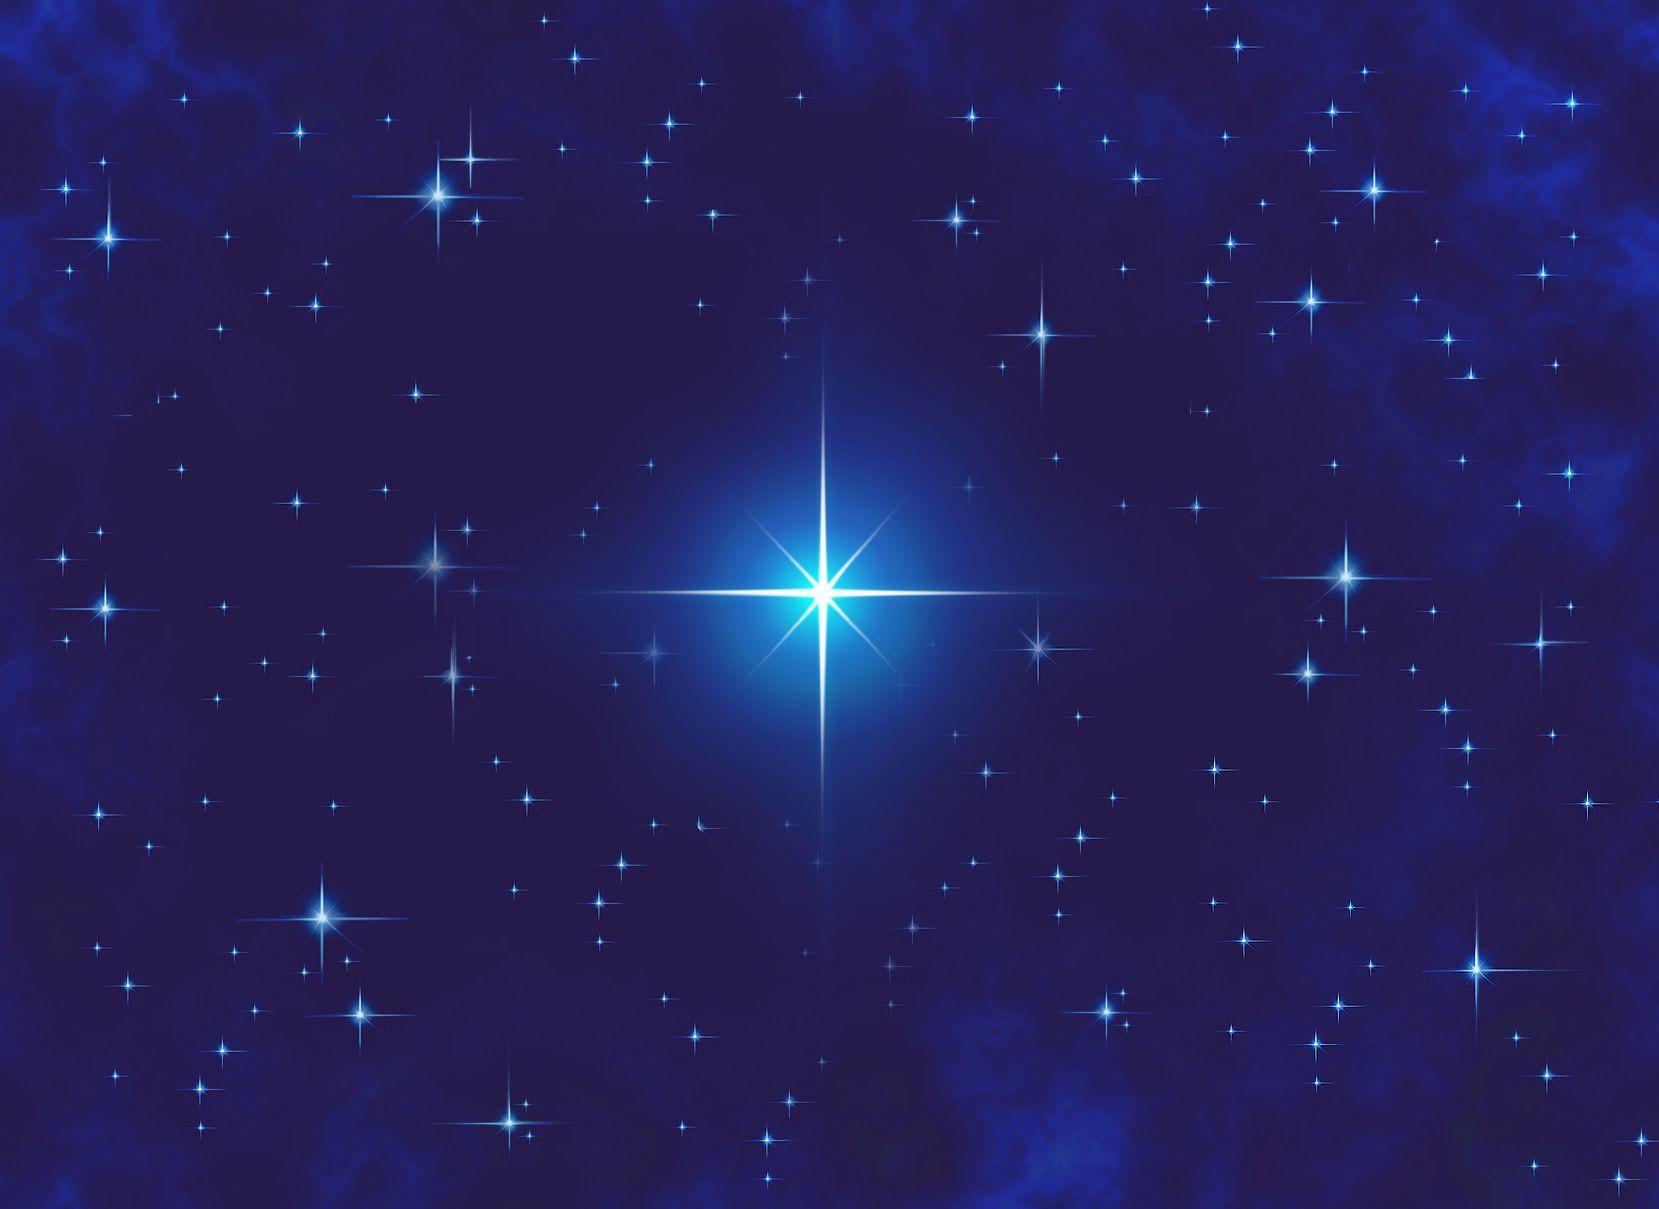 Анимация звезда на небе, волков крутые